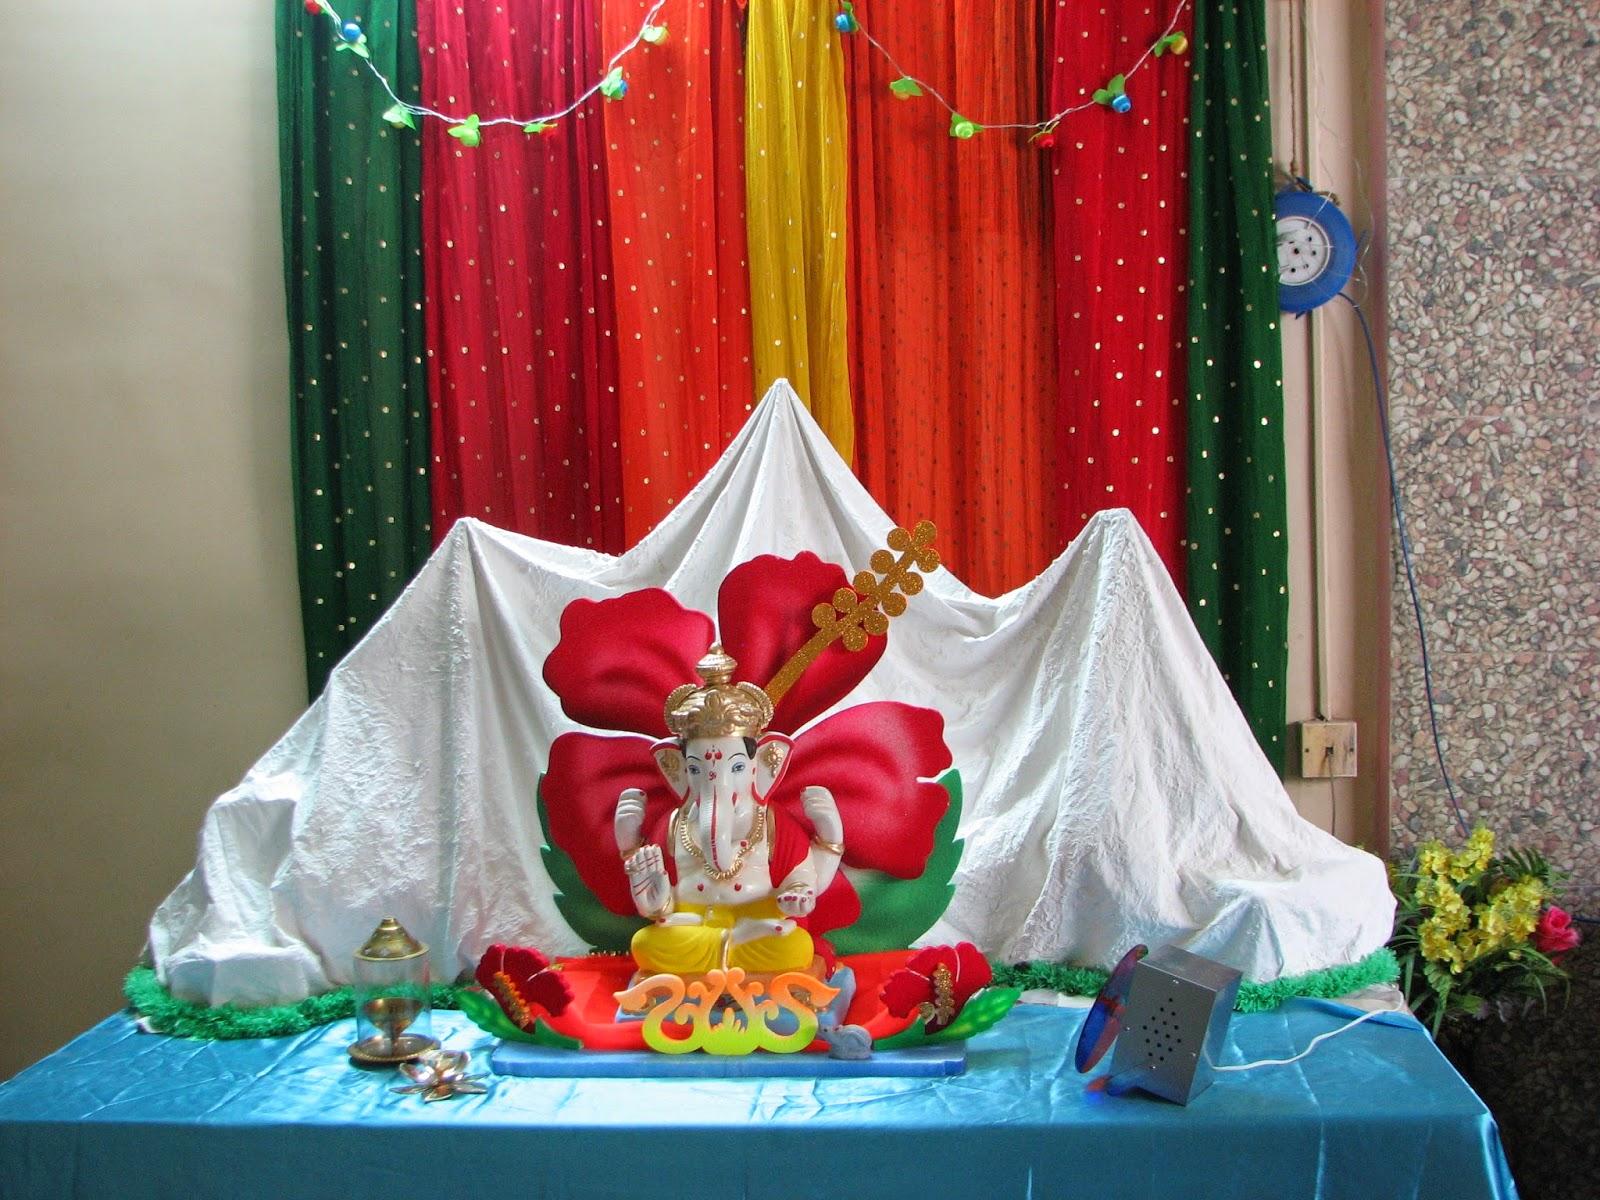 ganapati decorations himalaya from plaster of paris pop in ganesh